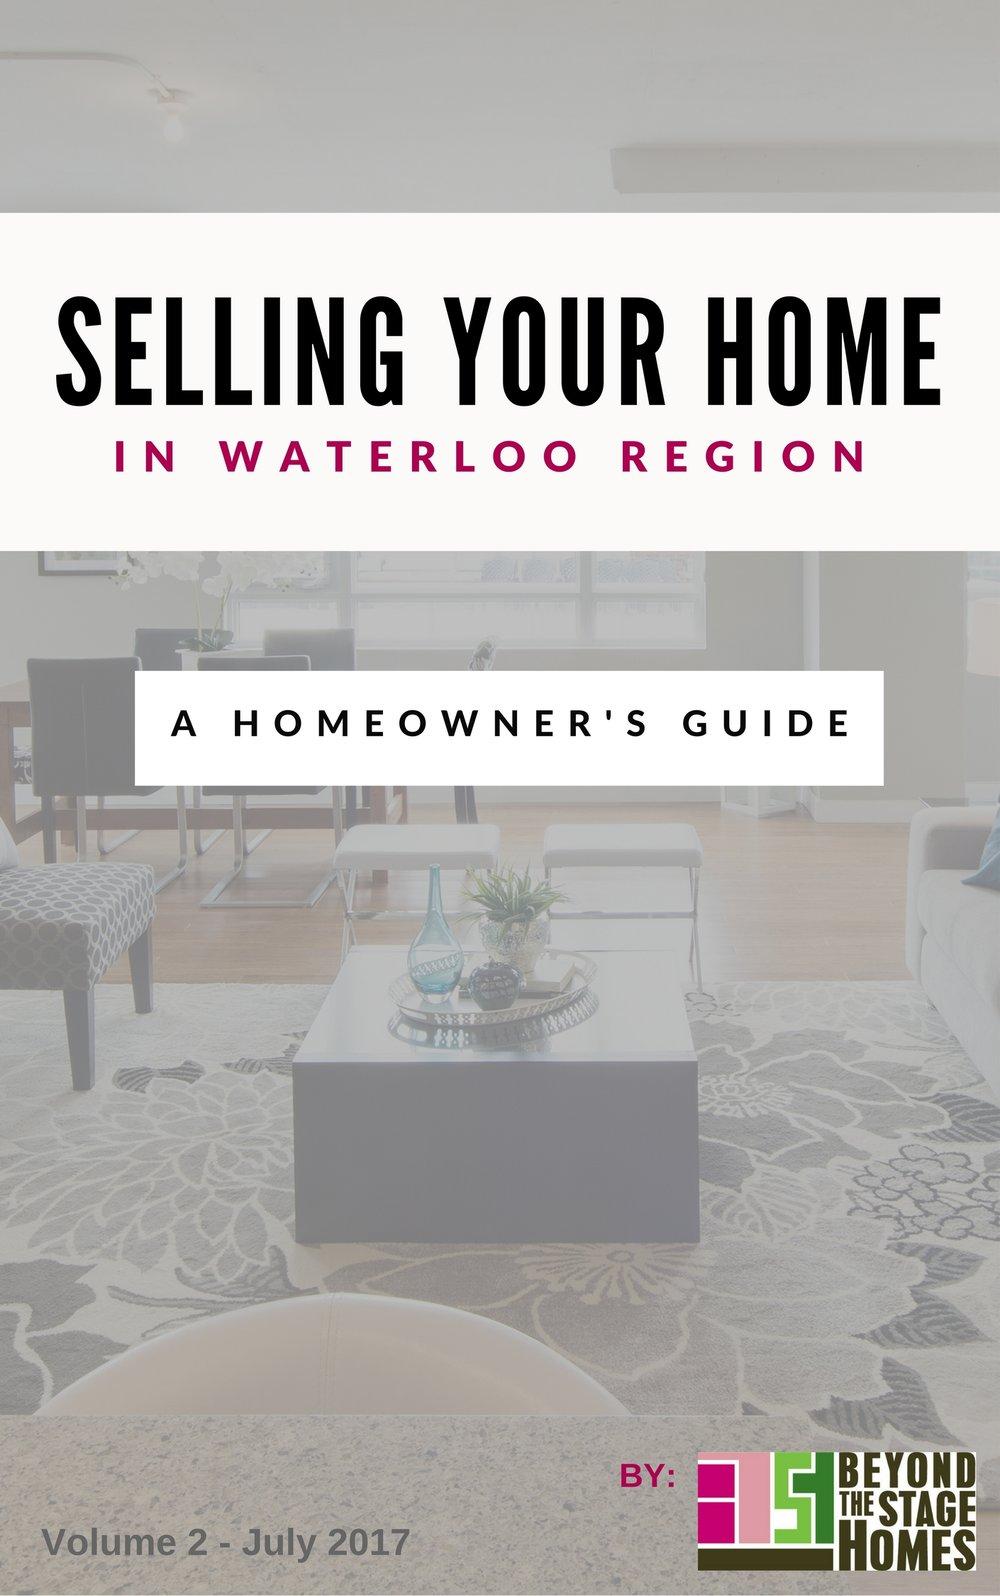 Selling Your Home in Waterloo Region